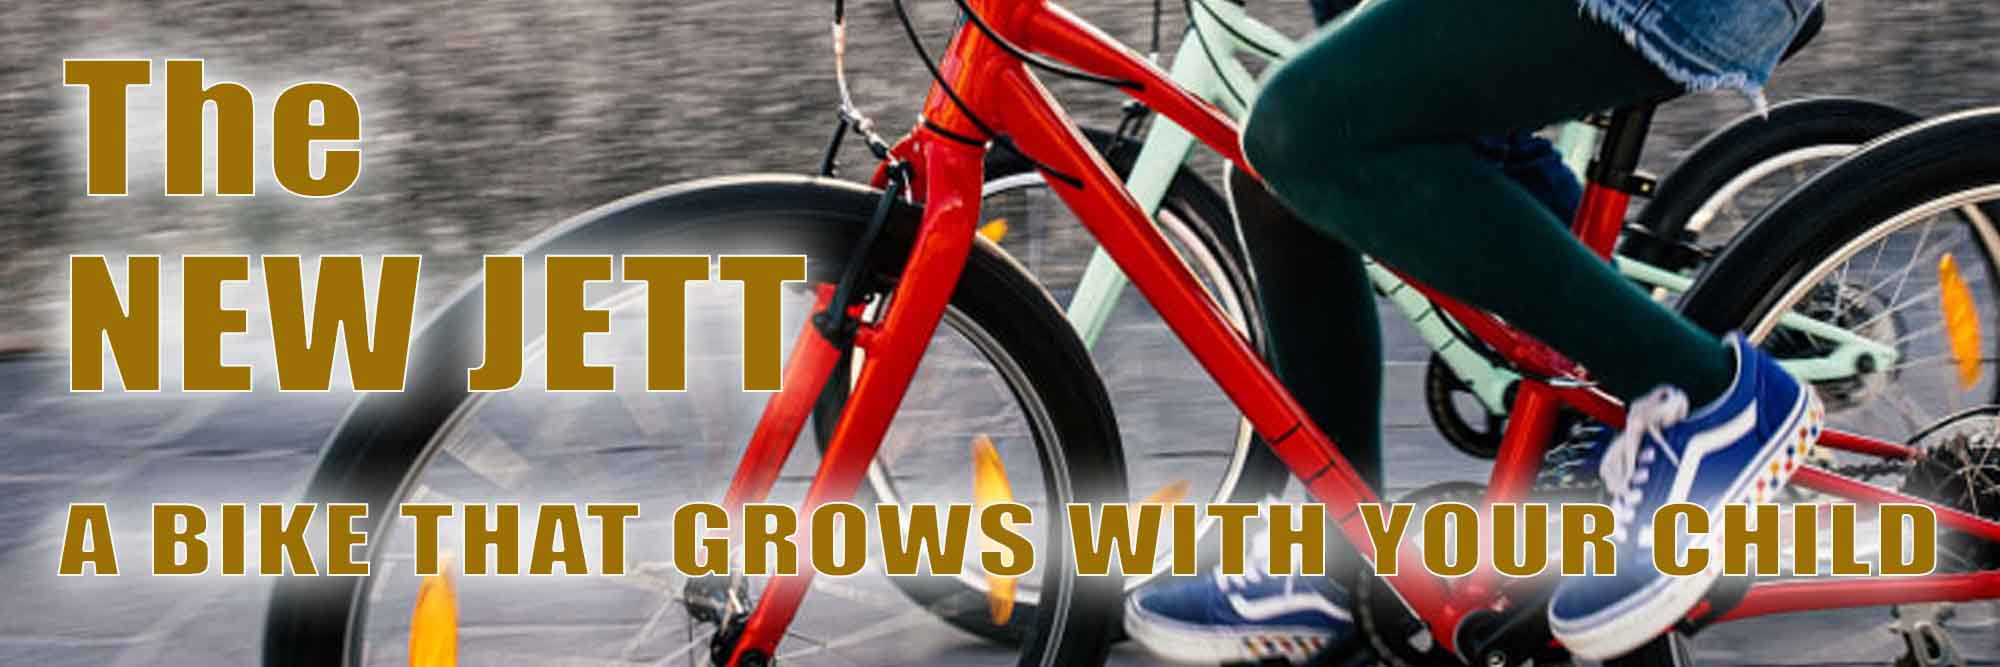 The New Specialized Kid's Jett Bikes